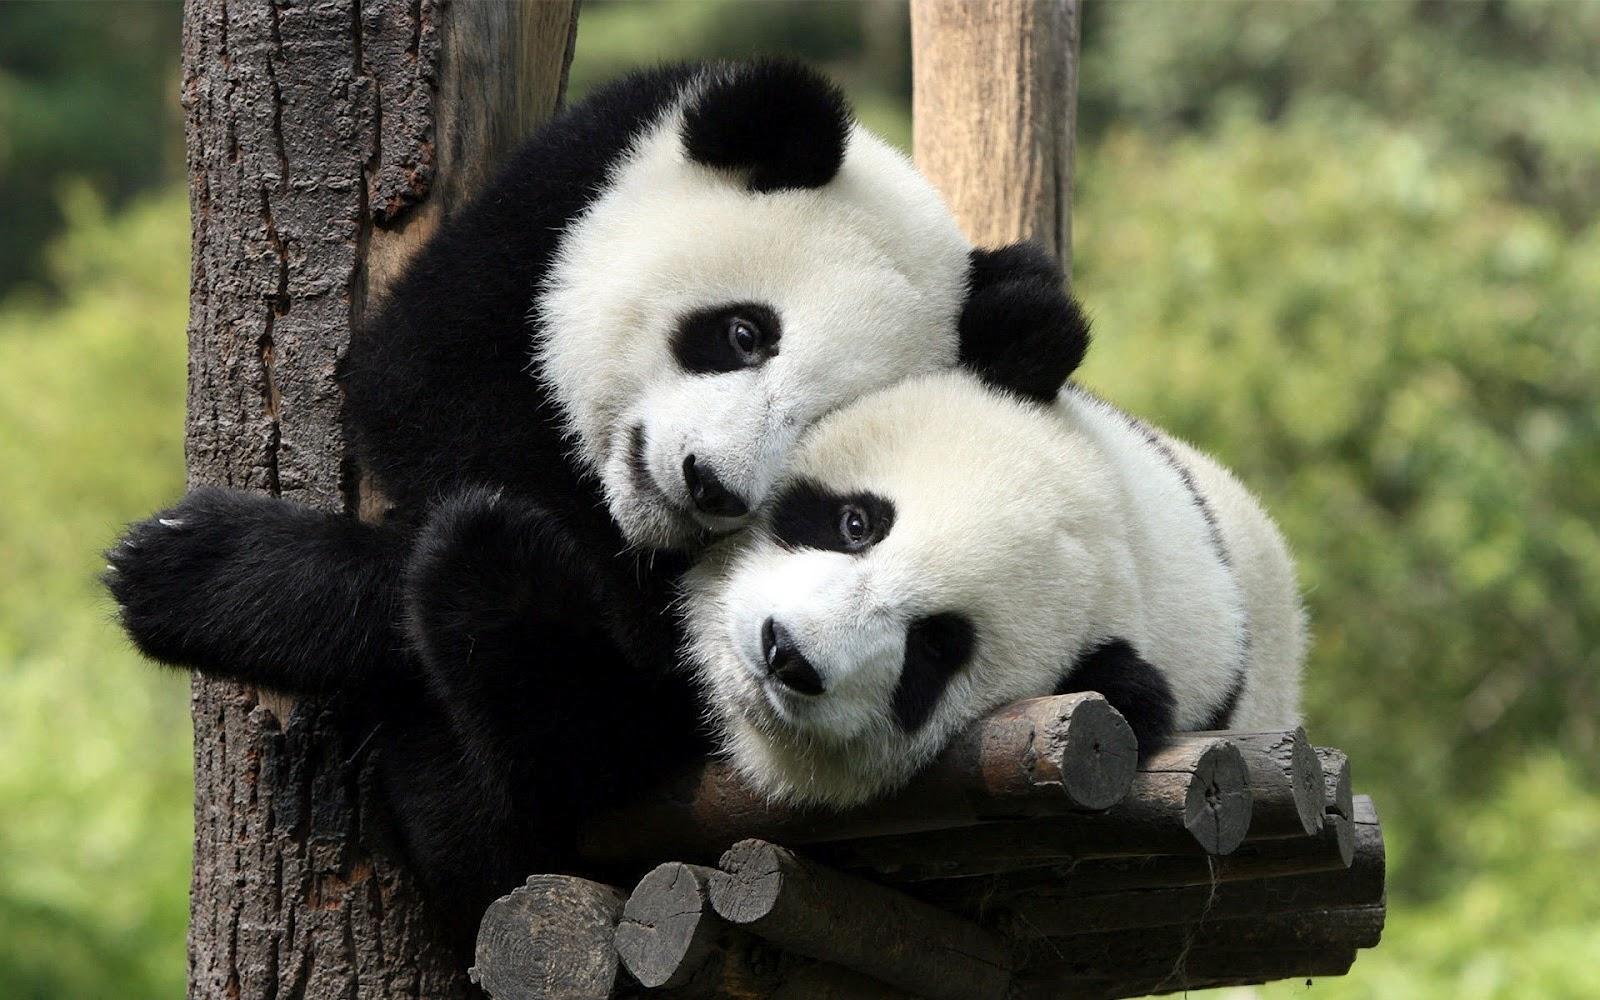 animal wallpaper of two panda bears in a tree Panda bear wallpaper 1600x1000